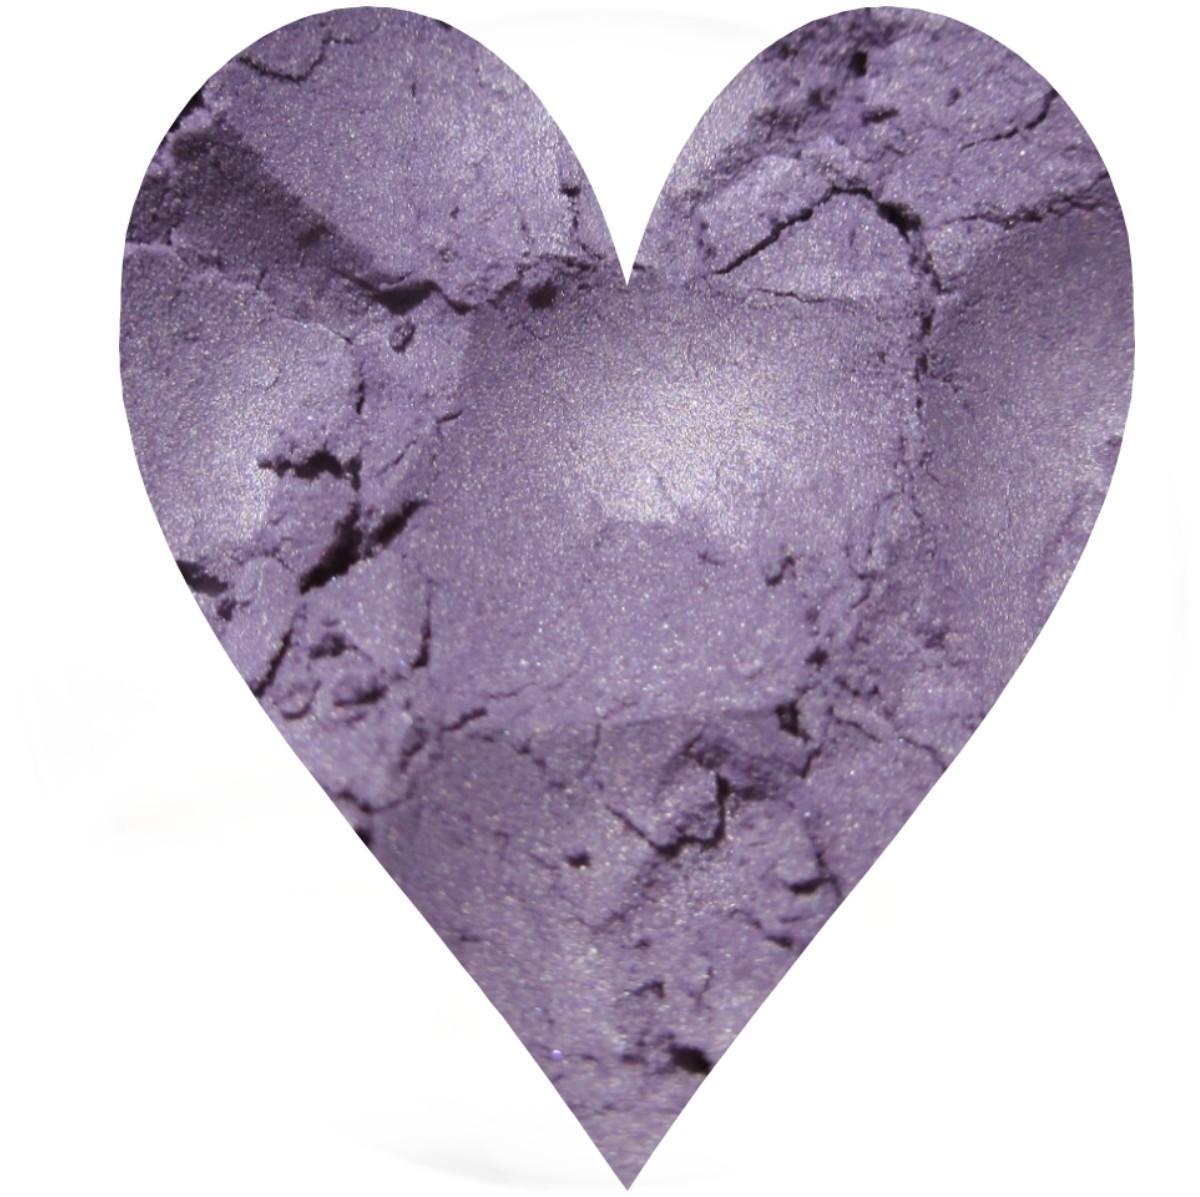 MY LOVE - LTD loose powder mineral multi-use color makeup bare earth pigment minerals